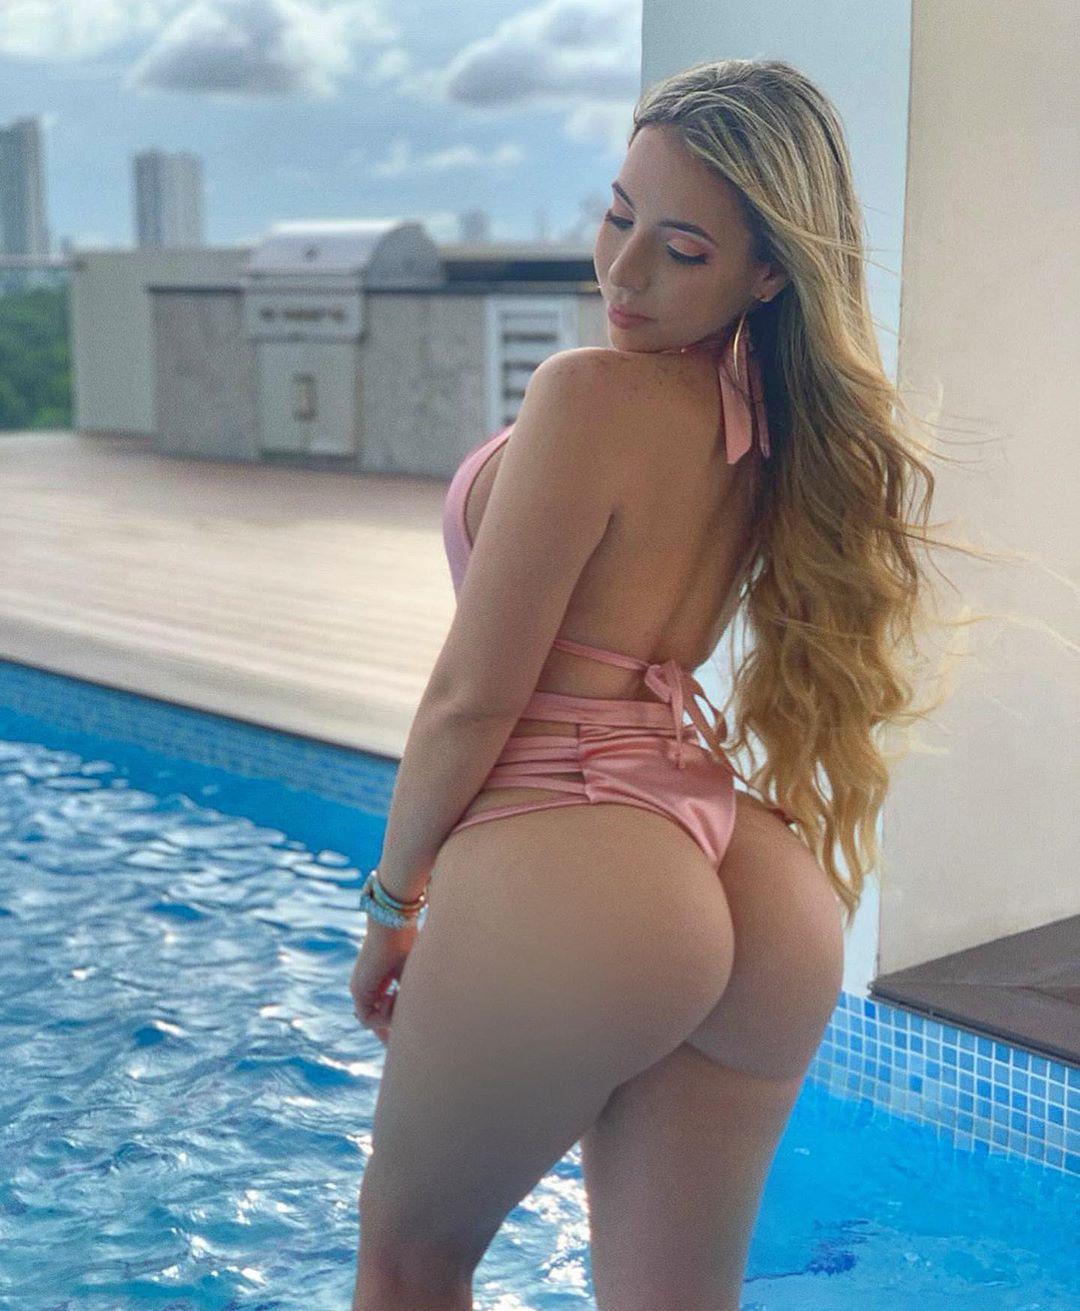 vanessa_bohorquez013.jpg